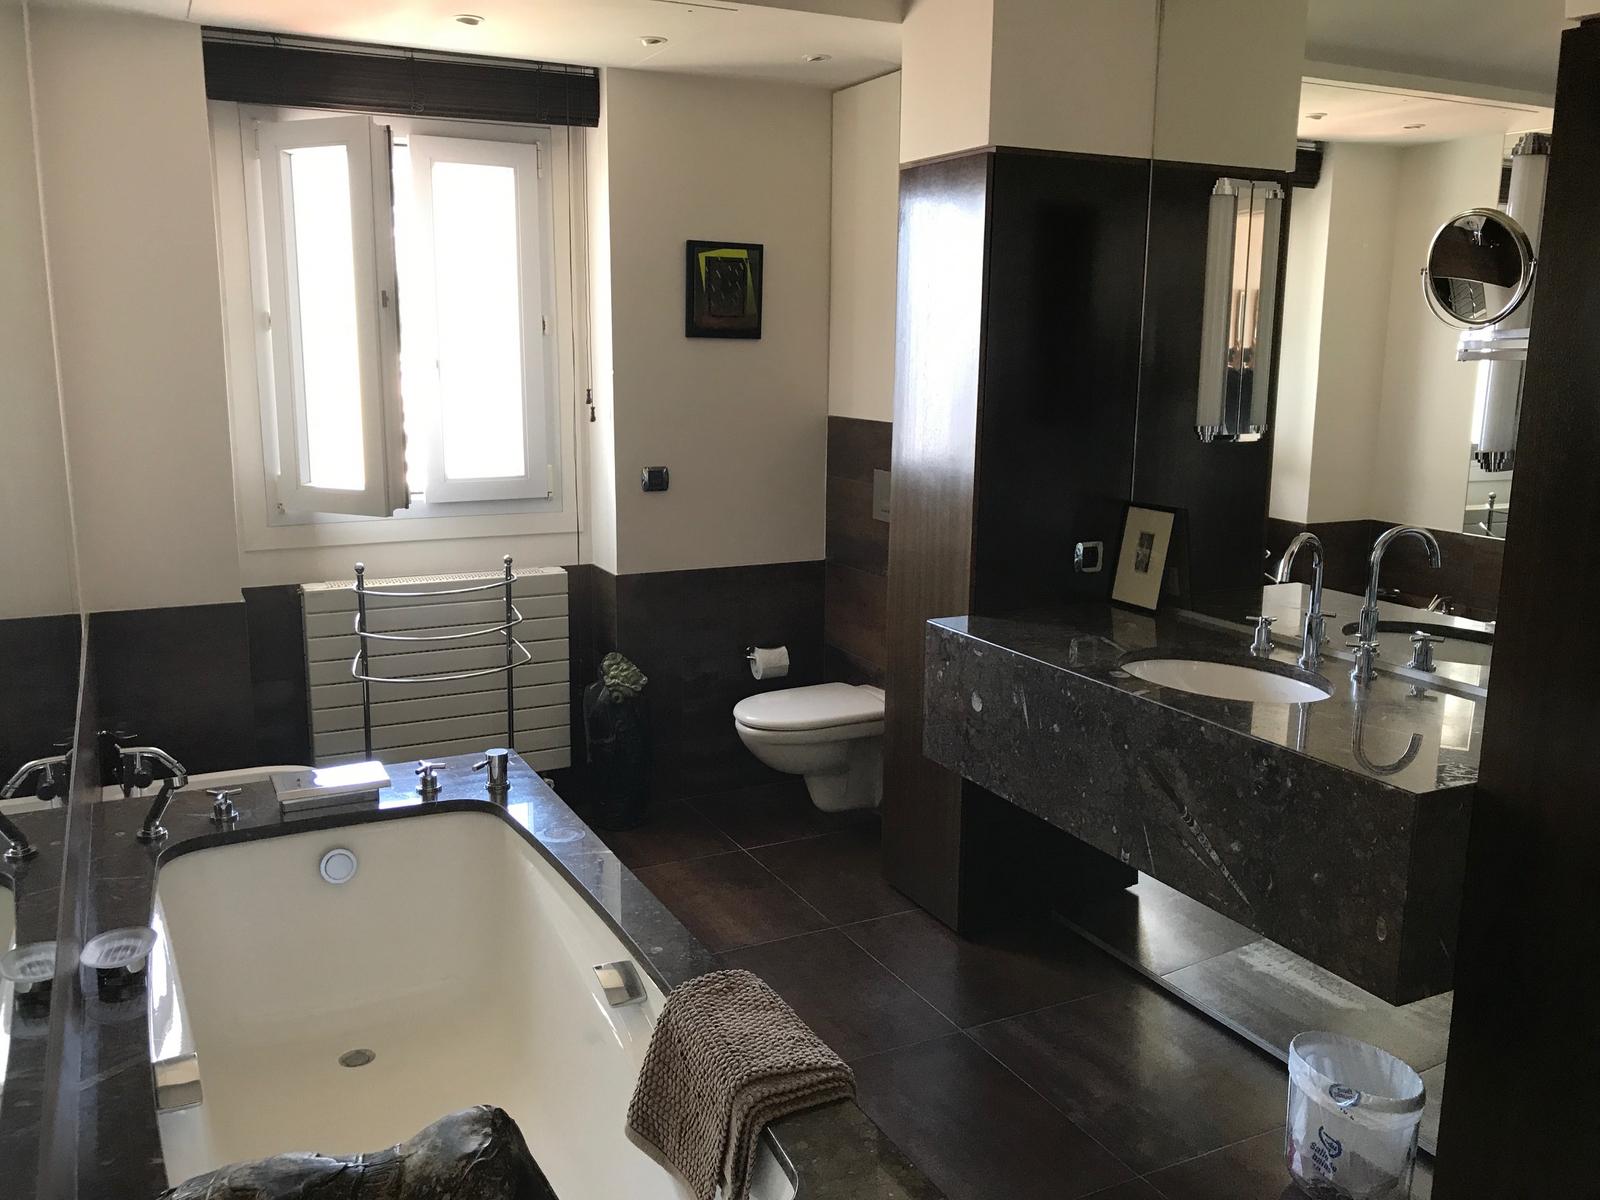 vente viager 4 pices 164 m 6450000 monaco 98. Black Bedroom Furniture Sets. Home Design Ideas